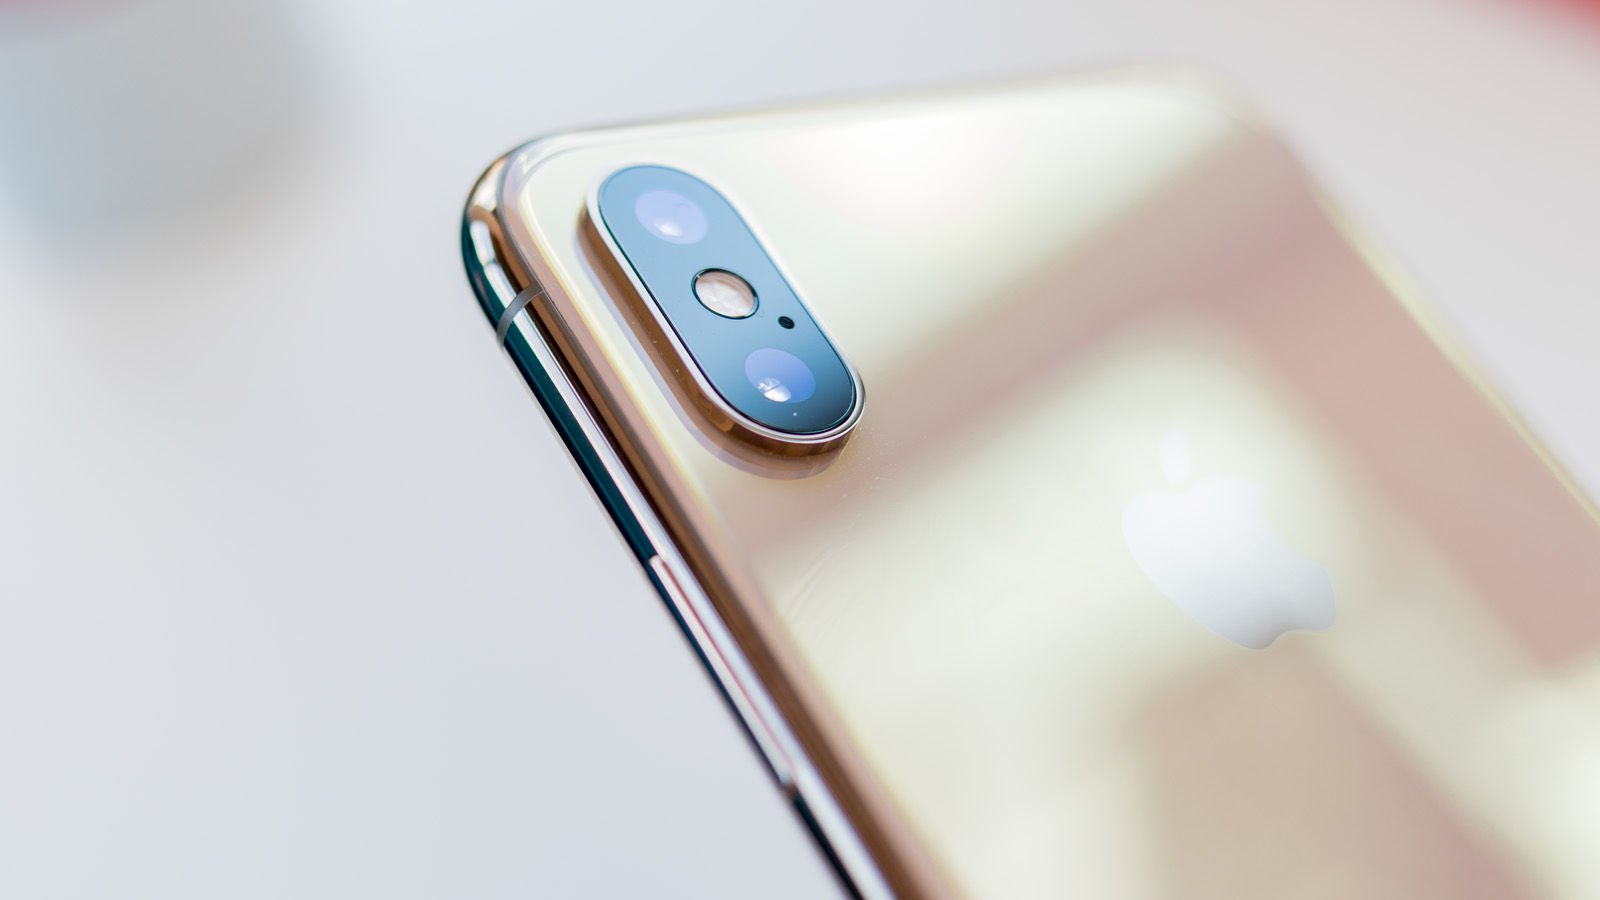 Ремонт iPhone XS - фото 1 | Сервисный центр Total Apple